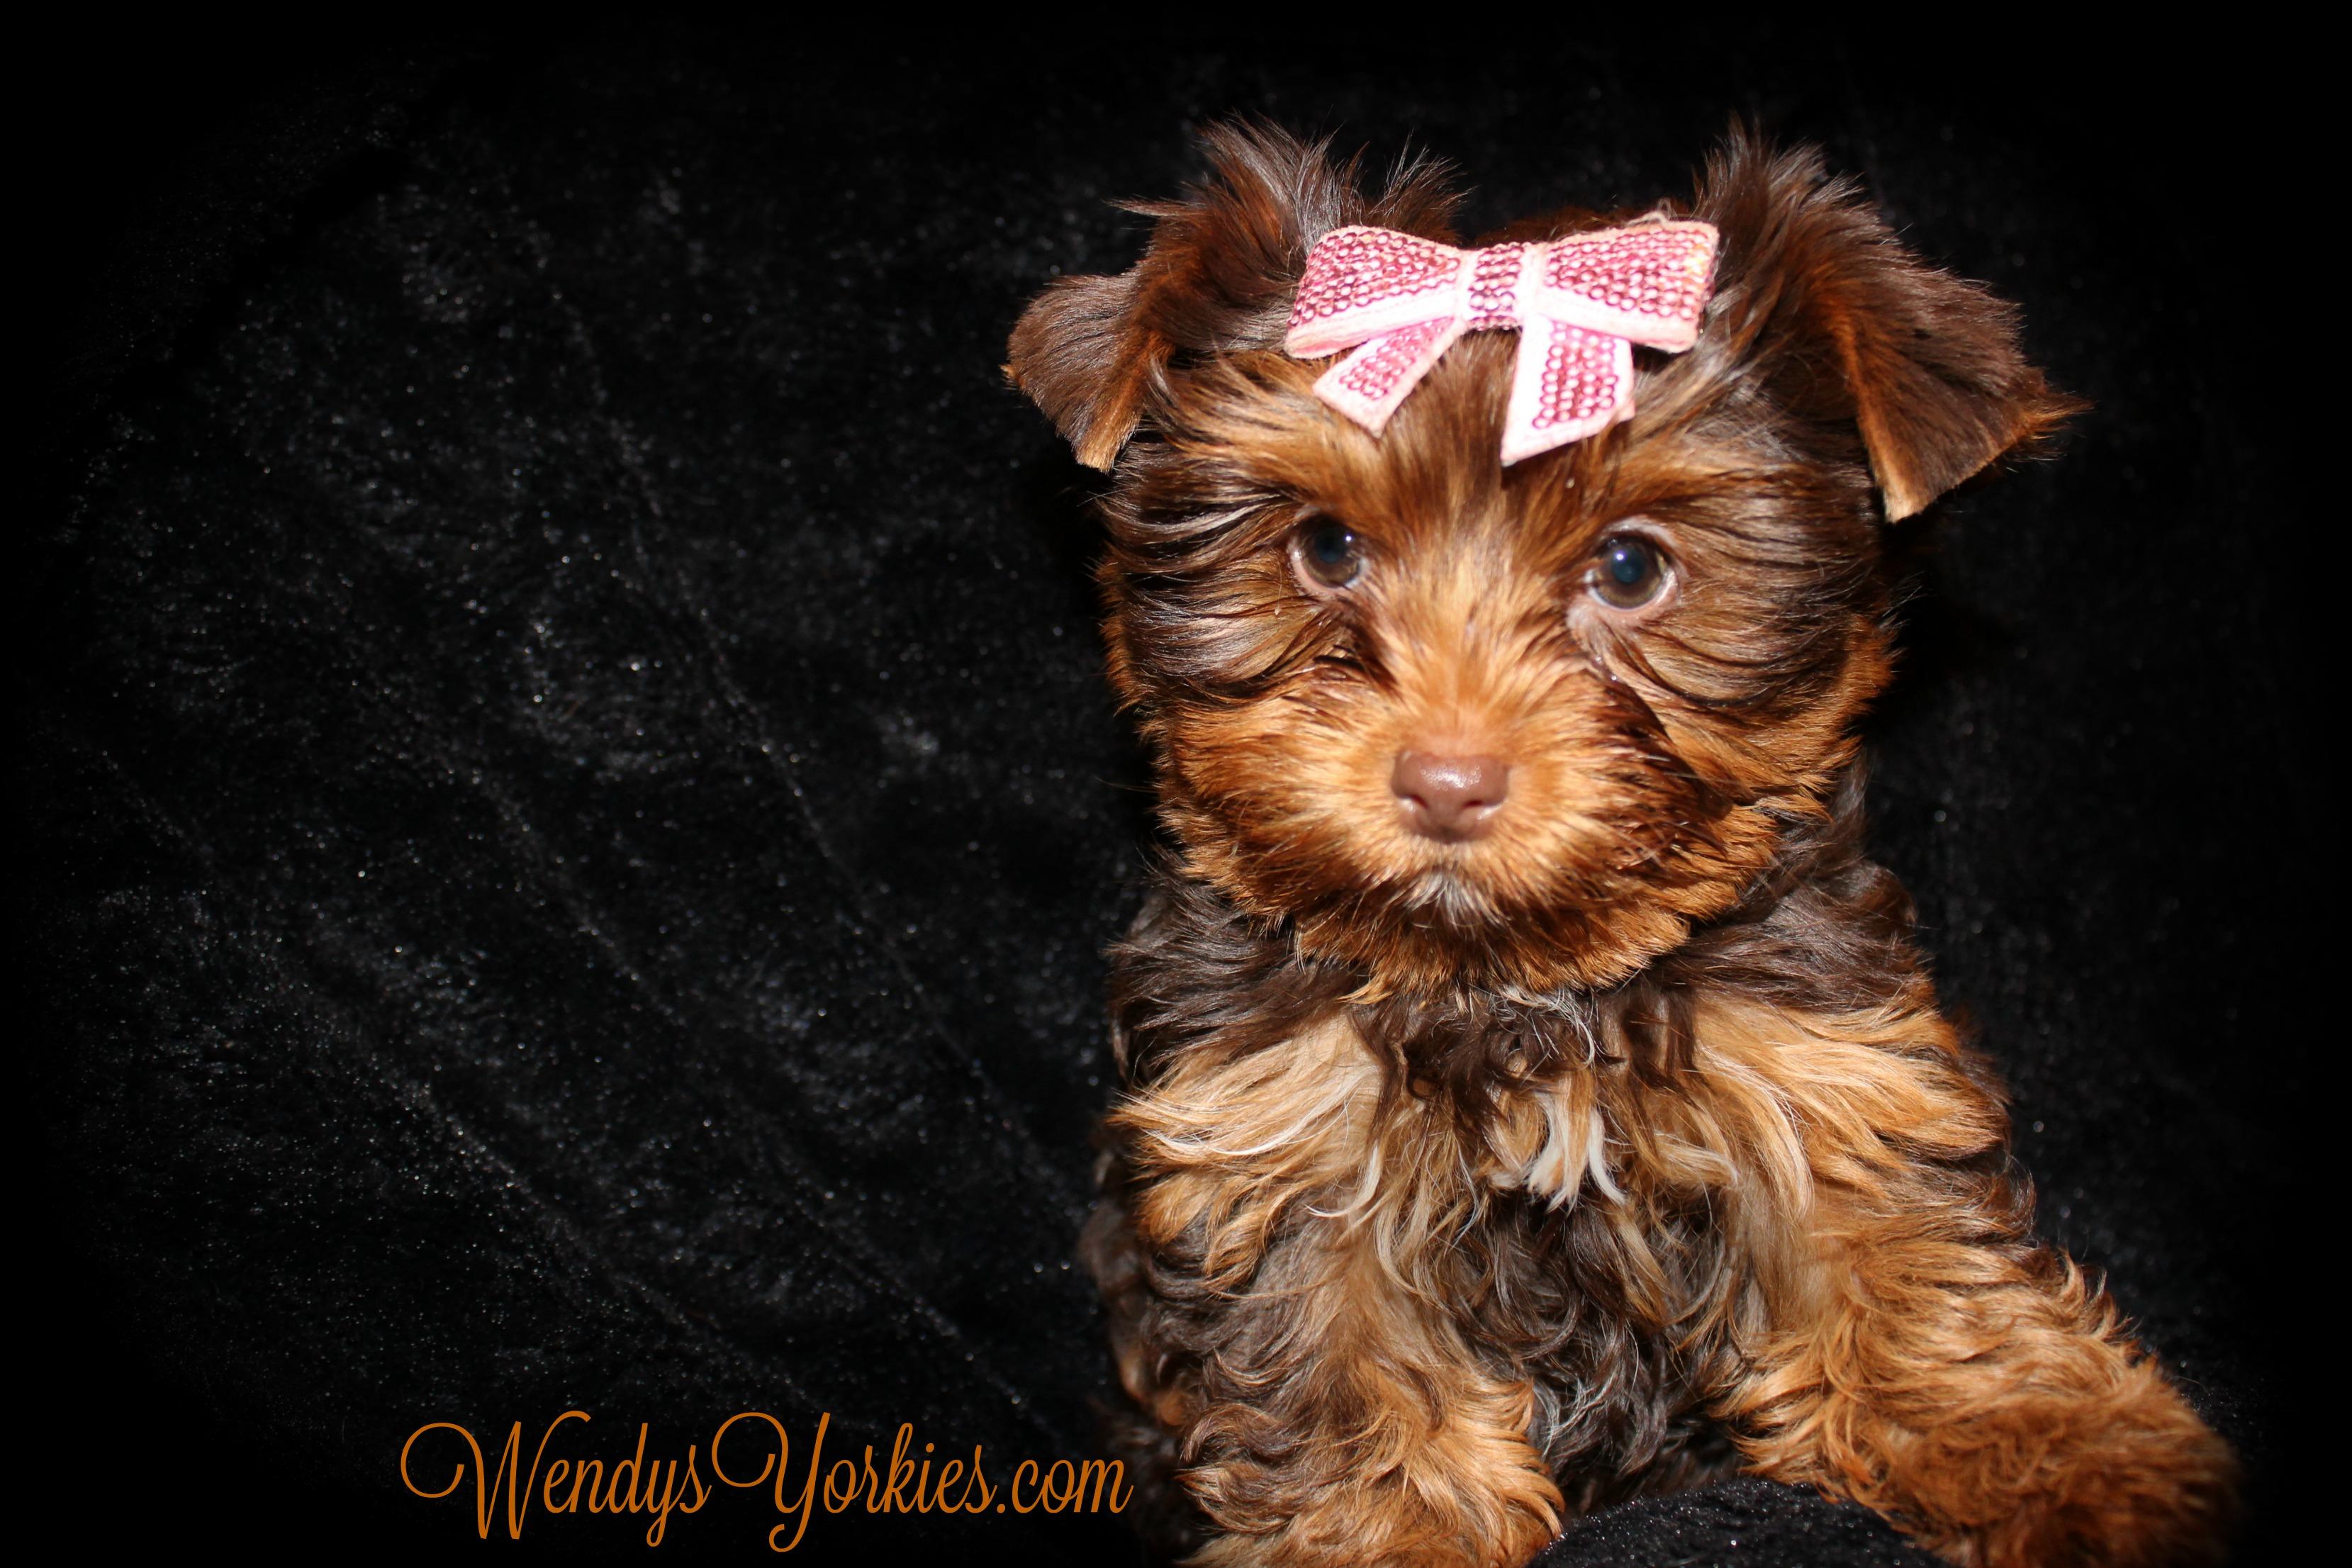 Cute Chocolate Yorkie puppy for sale, WEndysYorkies.com, Lela fc1